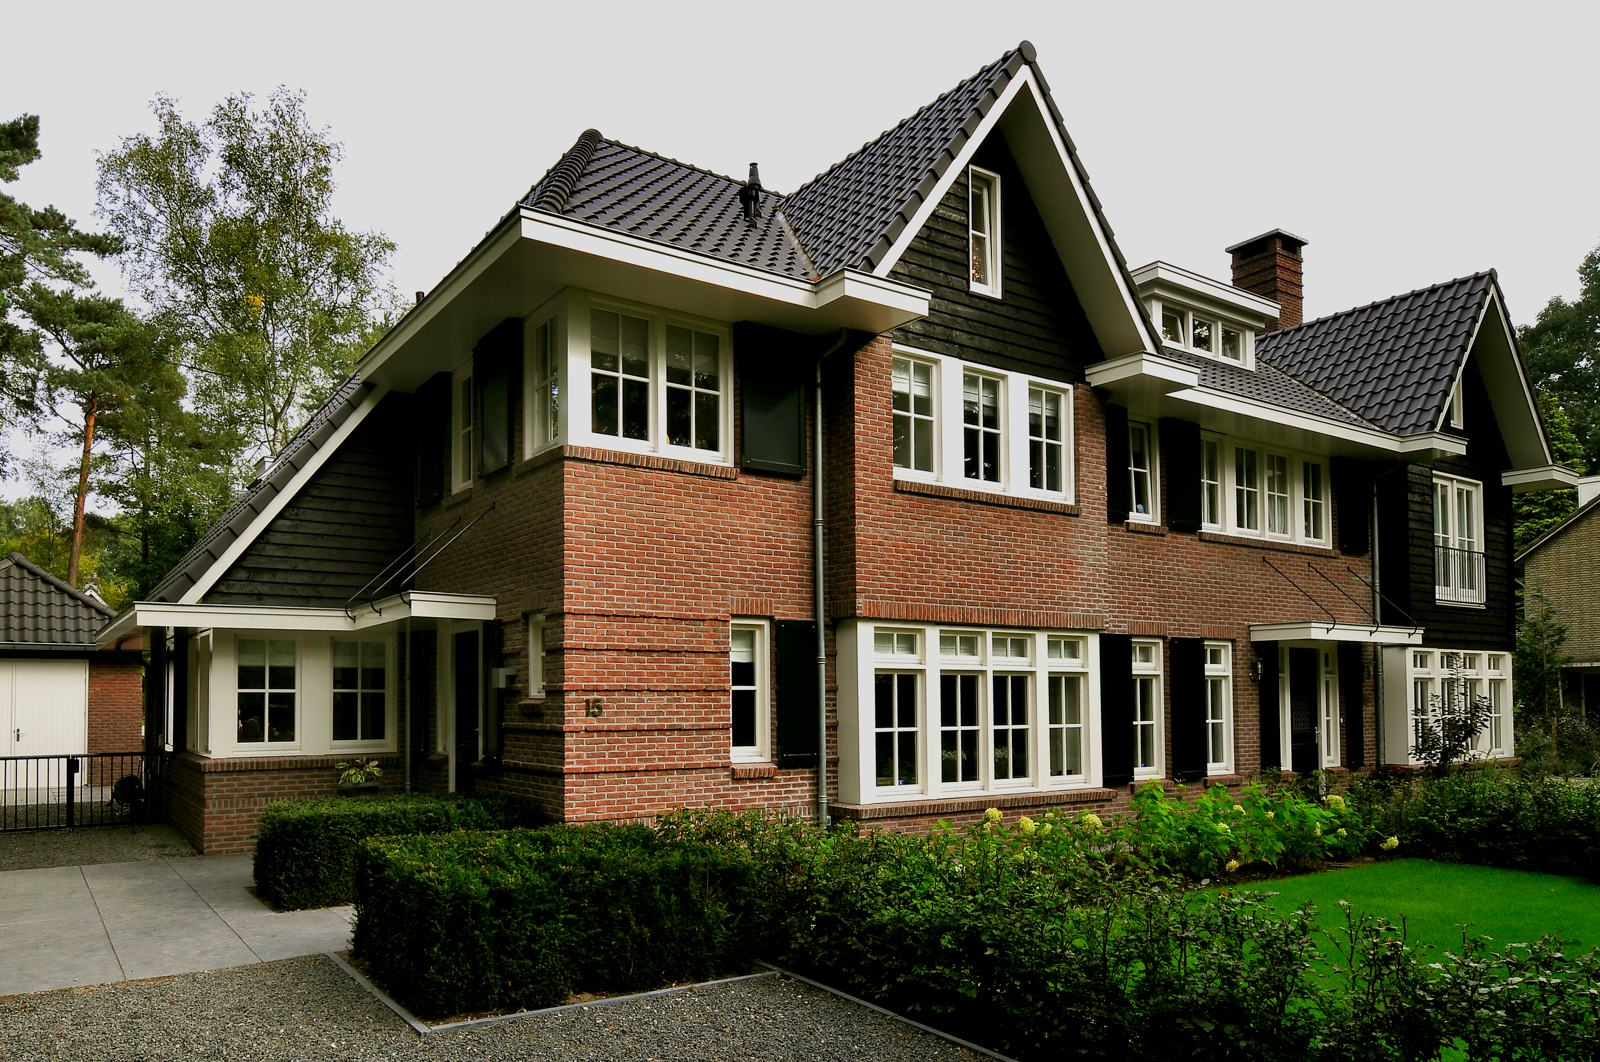 Huis Bouwen Kosten : Bungalow bouwen kosten woning bouwen with bungalow bouwen kosten